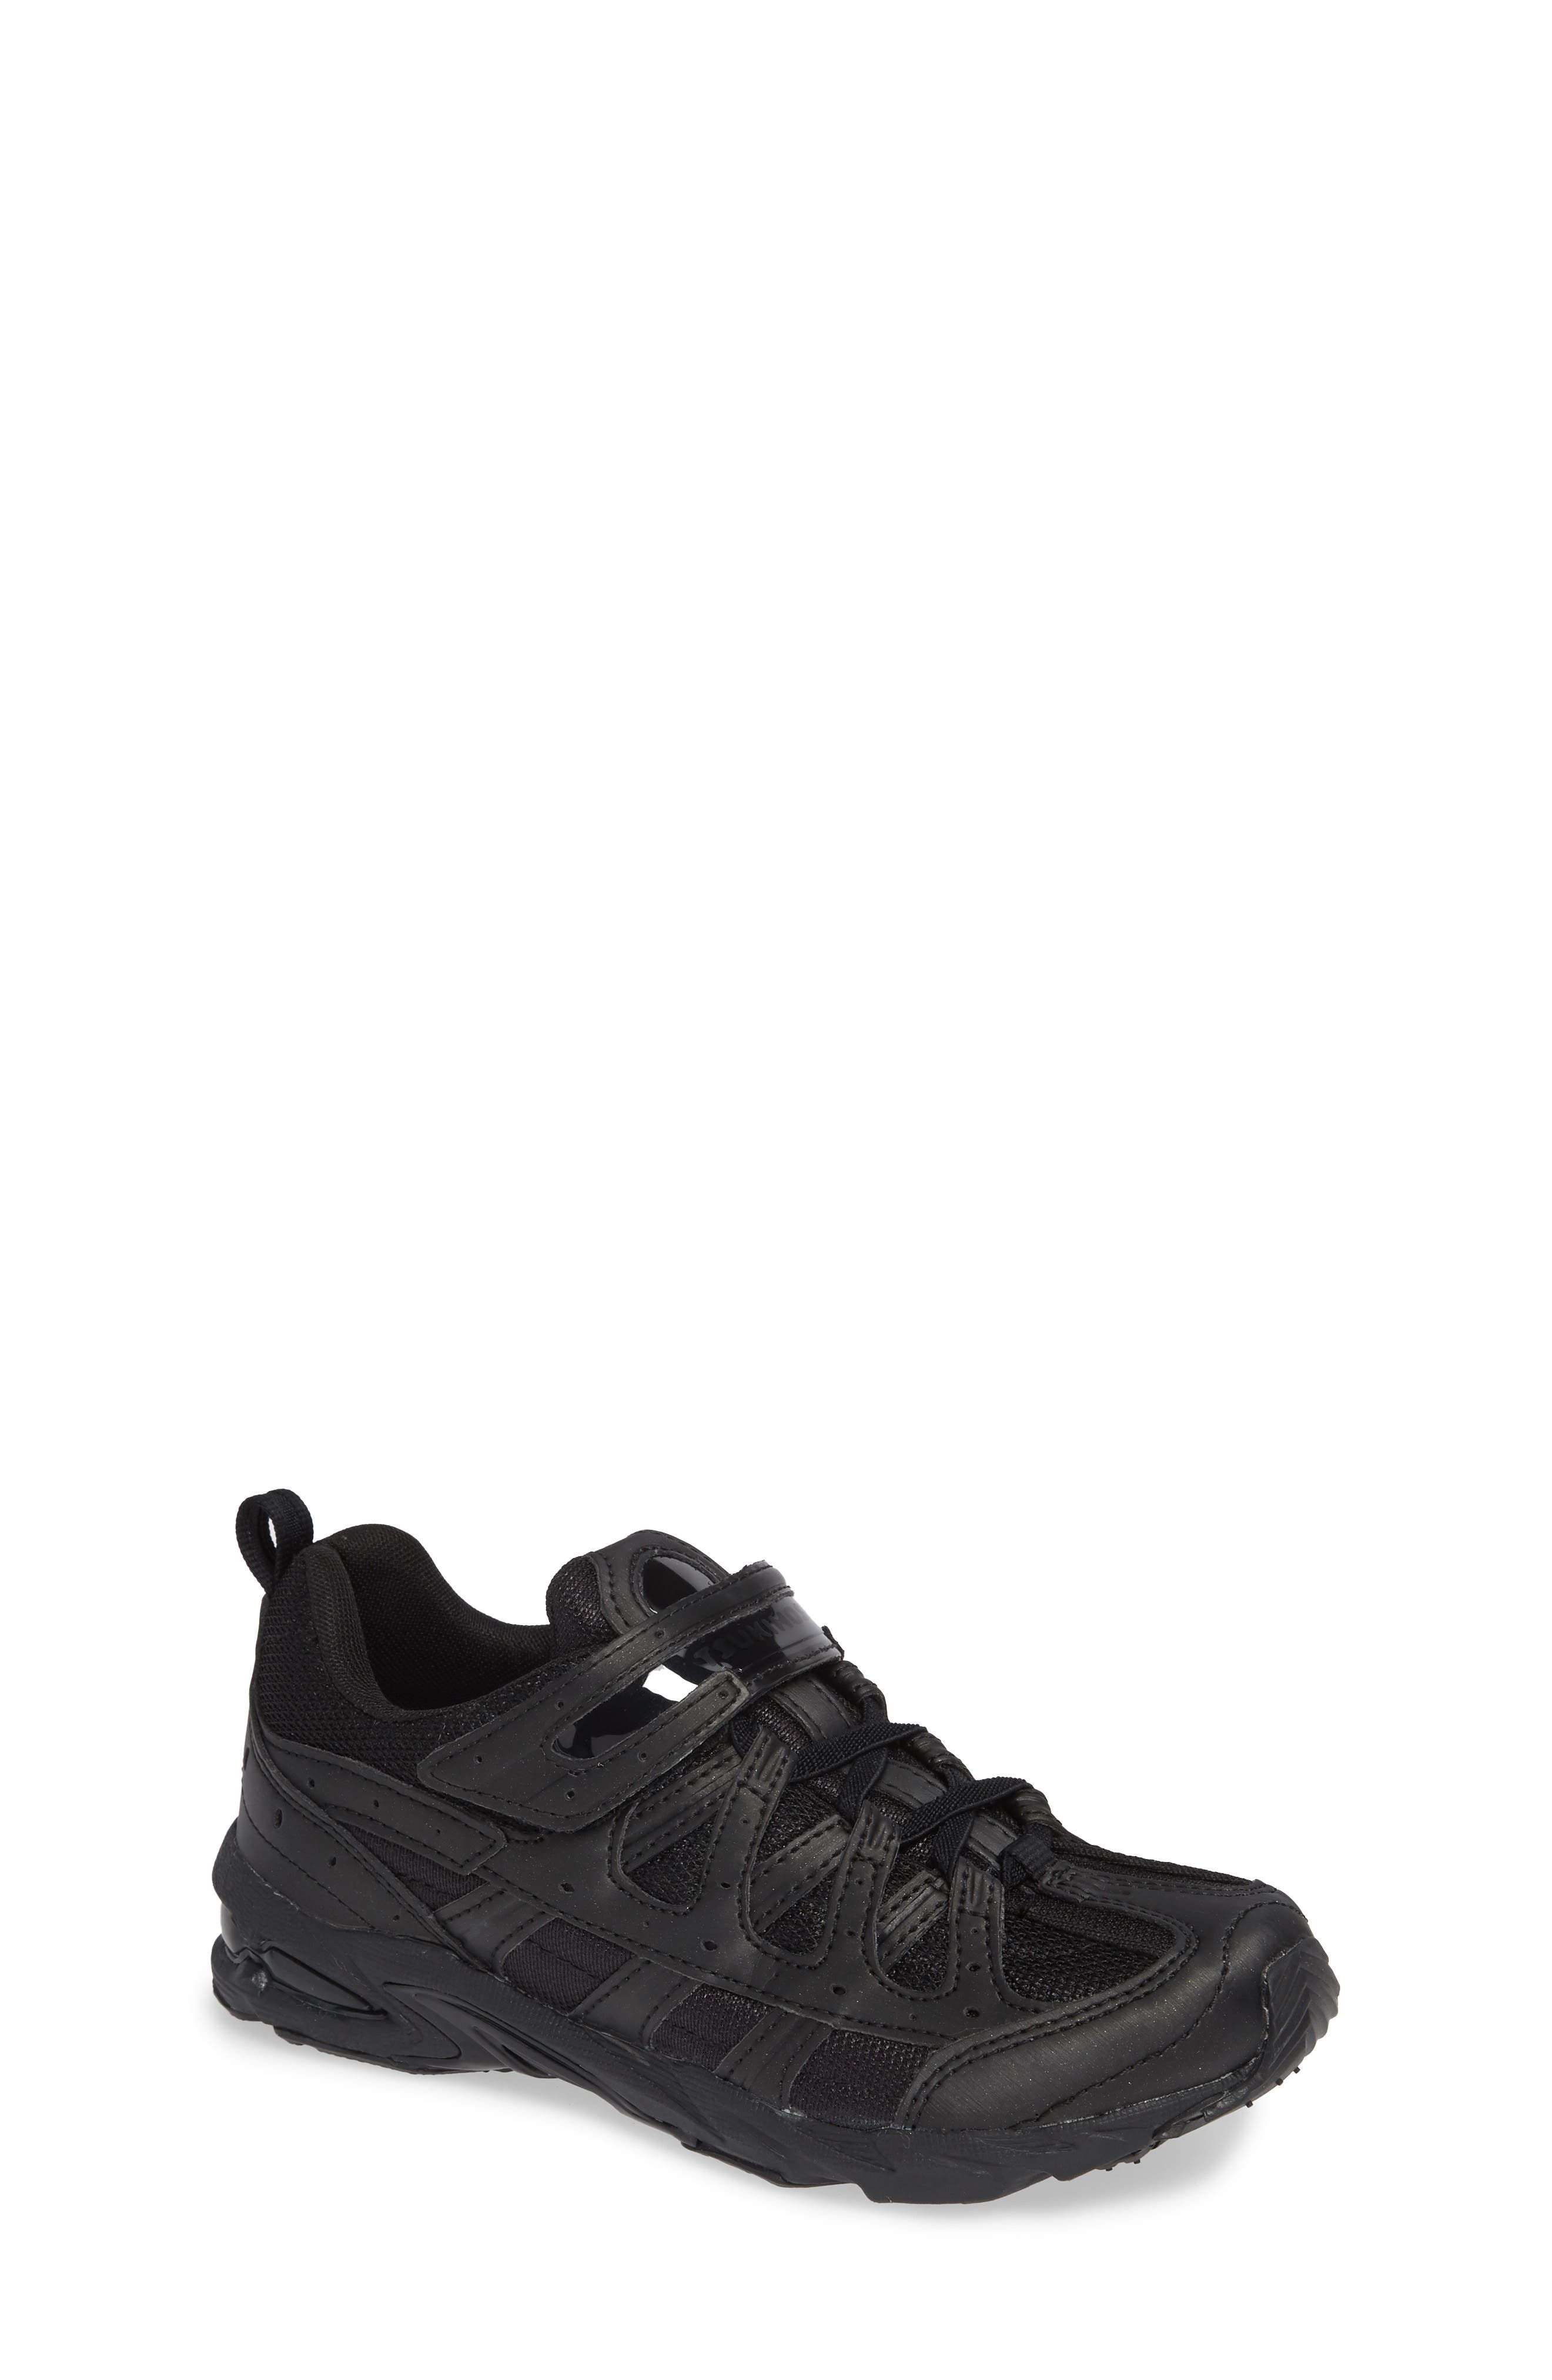 TSUKIHOSHI, Speed Washable Sneaker, Main thumbnail 1, color, BLACK/ NOIR